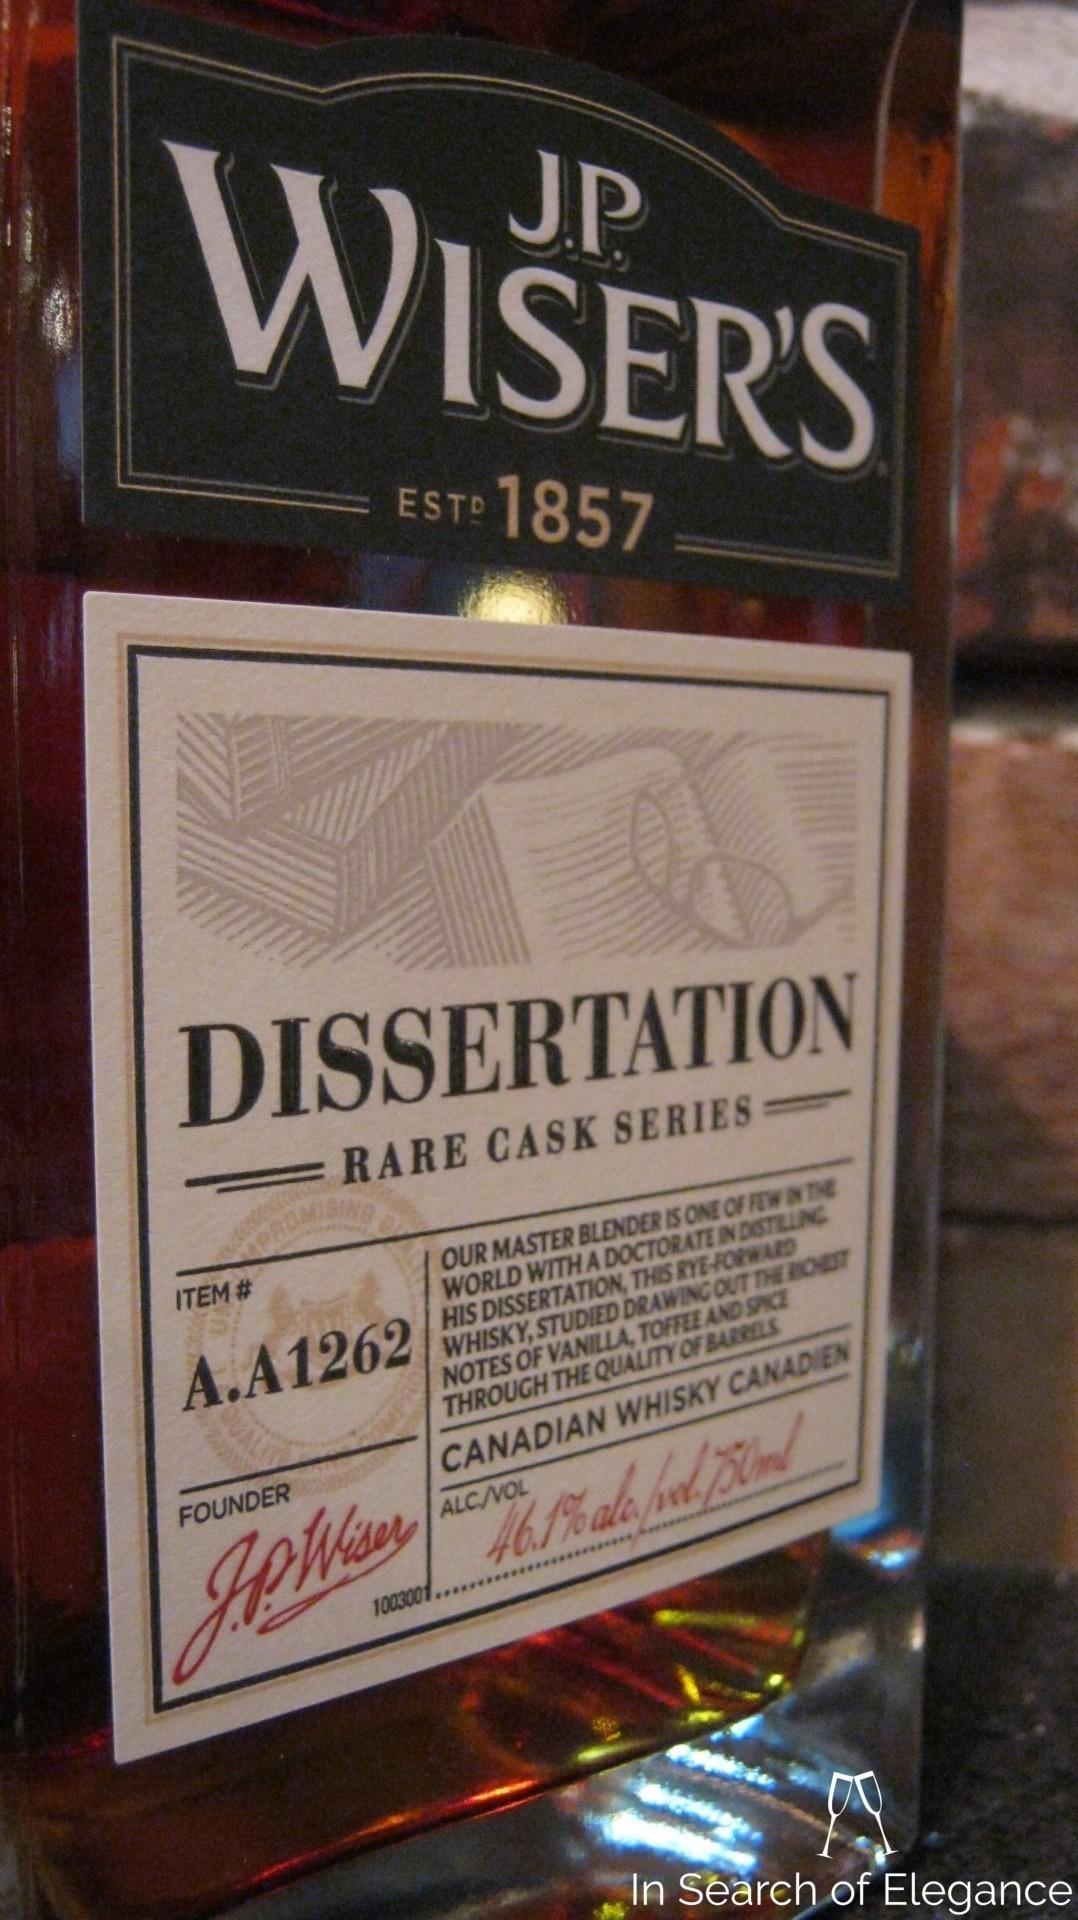 Wiser's Dissertation.jpg